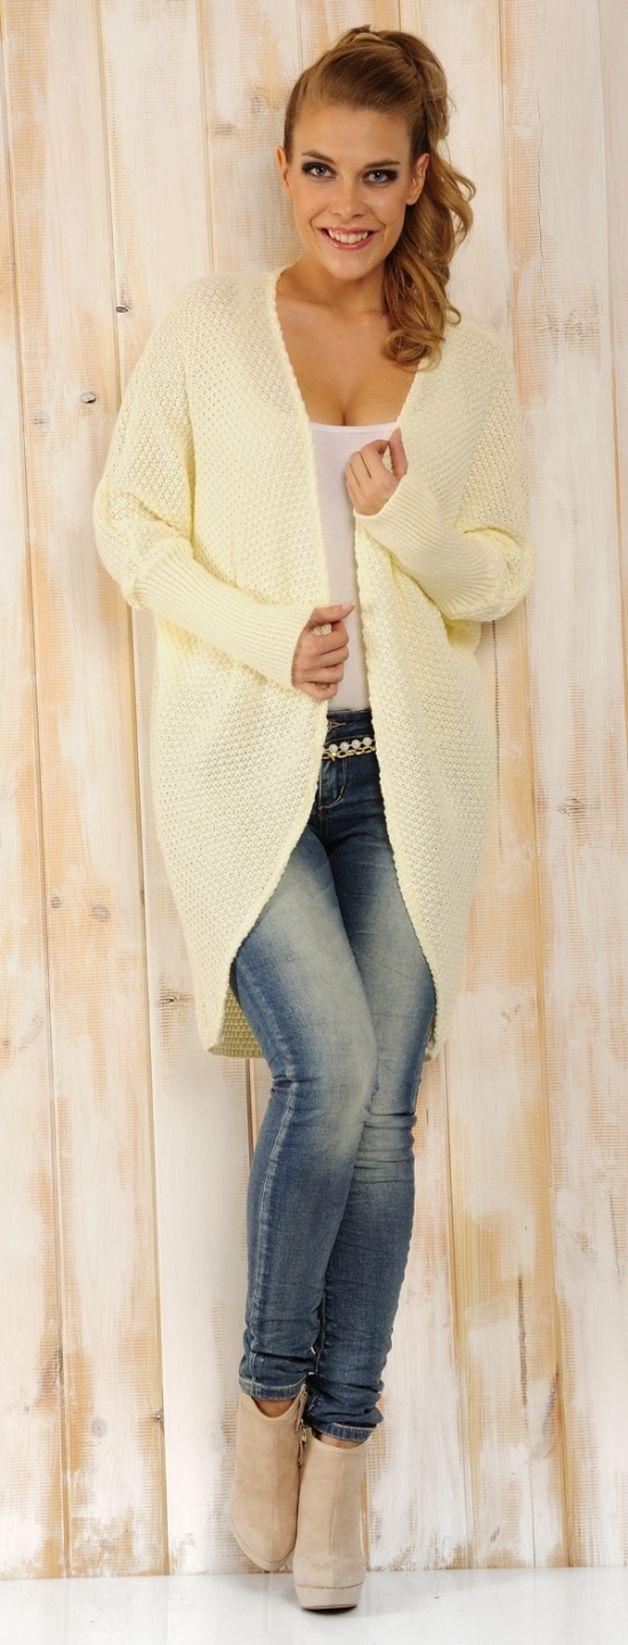 Mimi45 Pinacolada UNIWERSALNY - Sweter kolor ekri - Lemoniade - Blezery